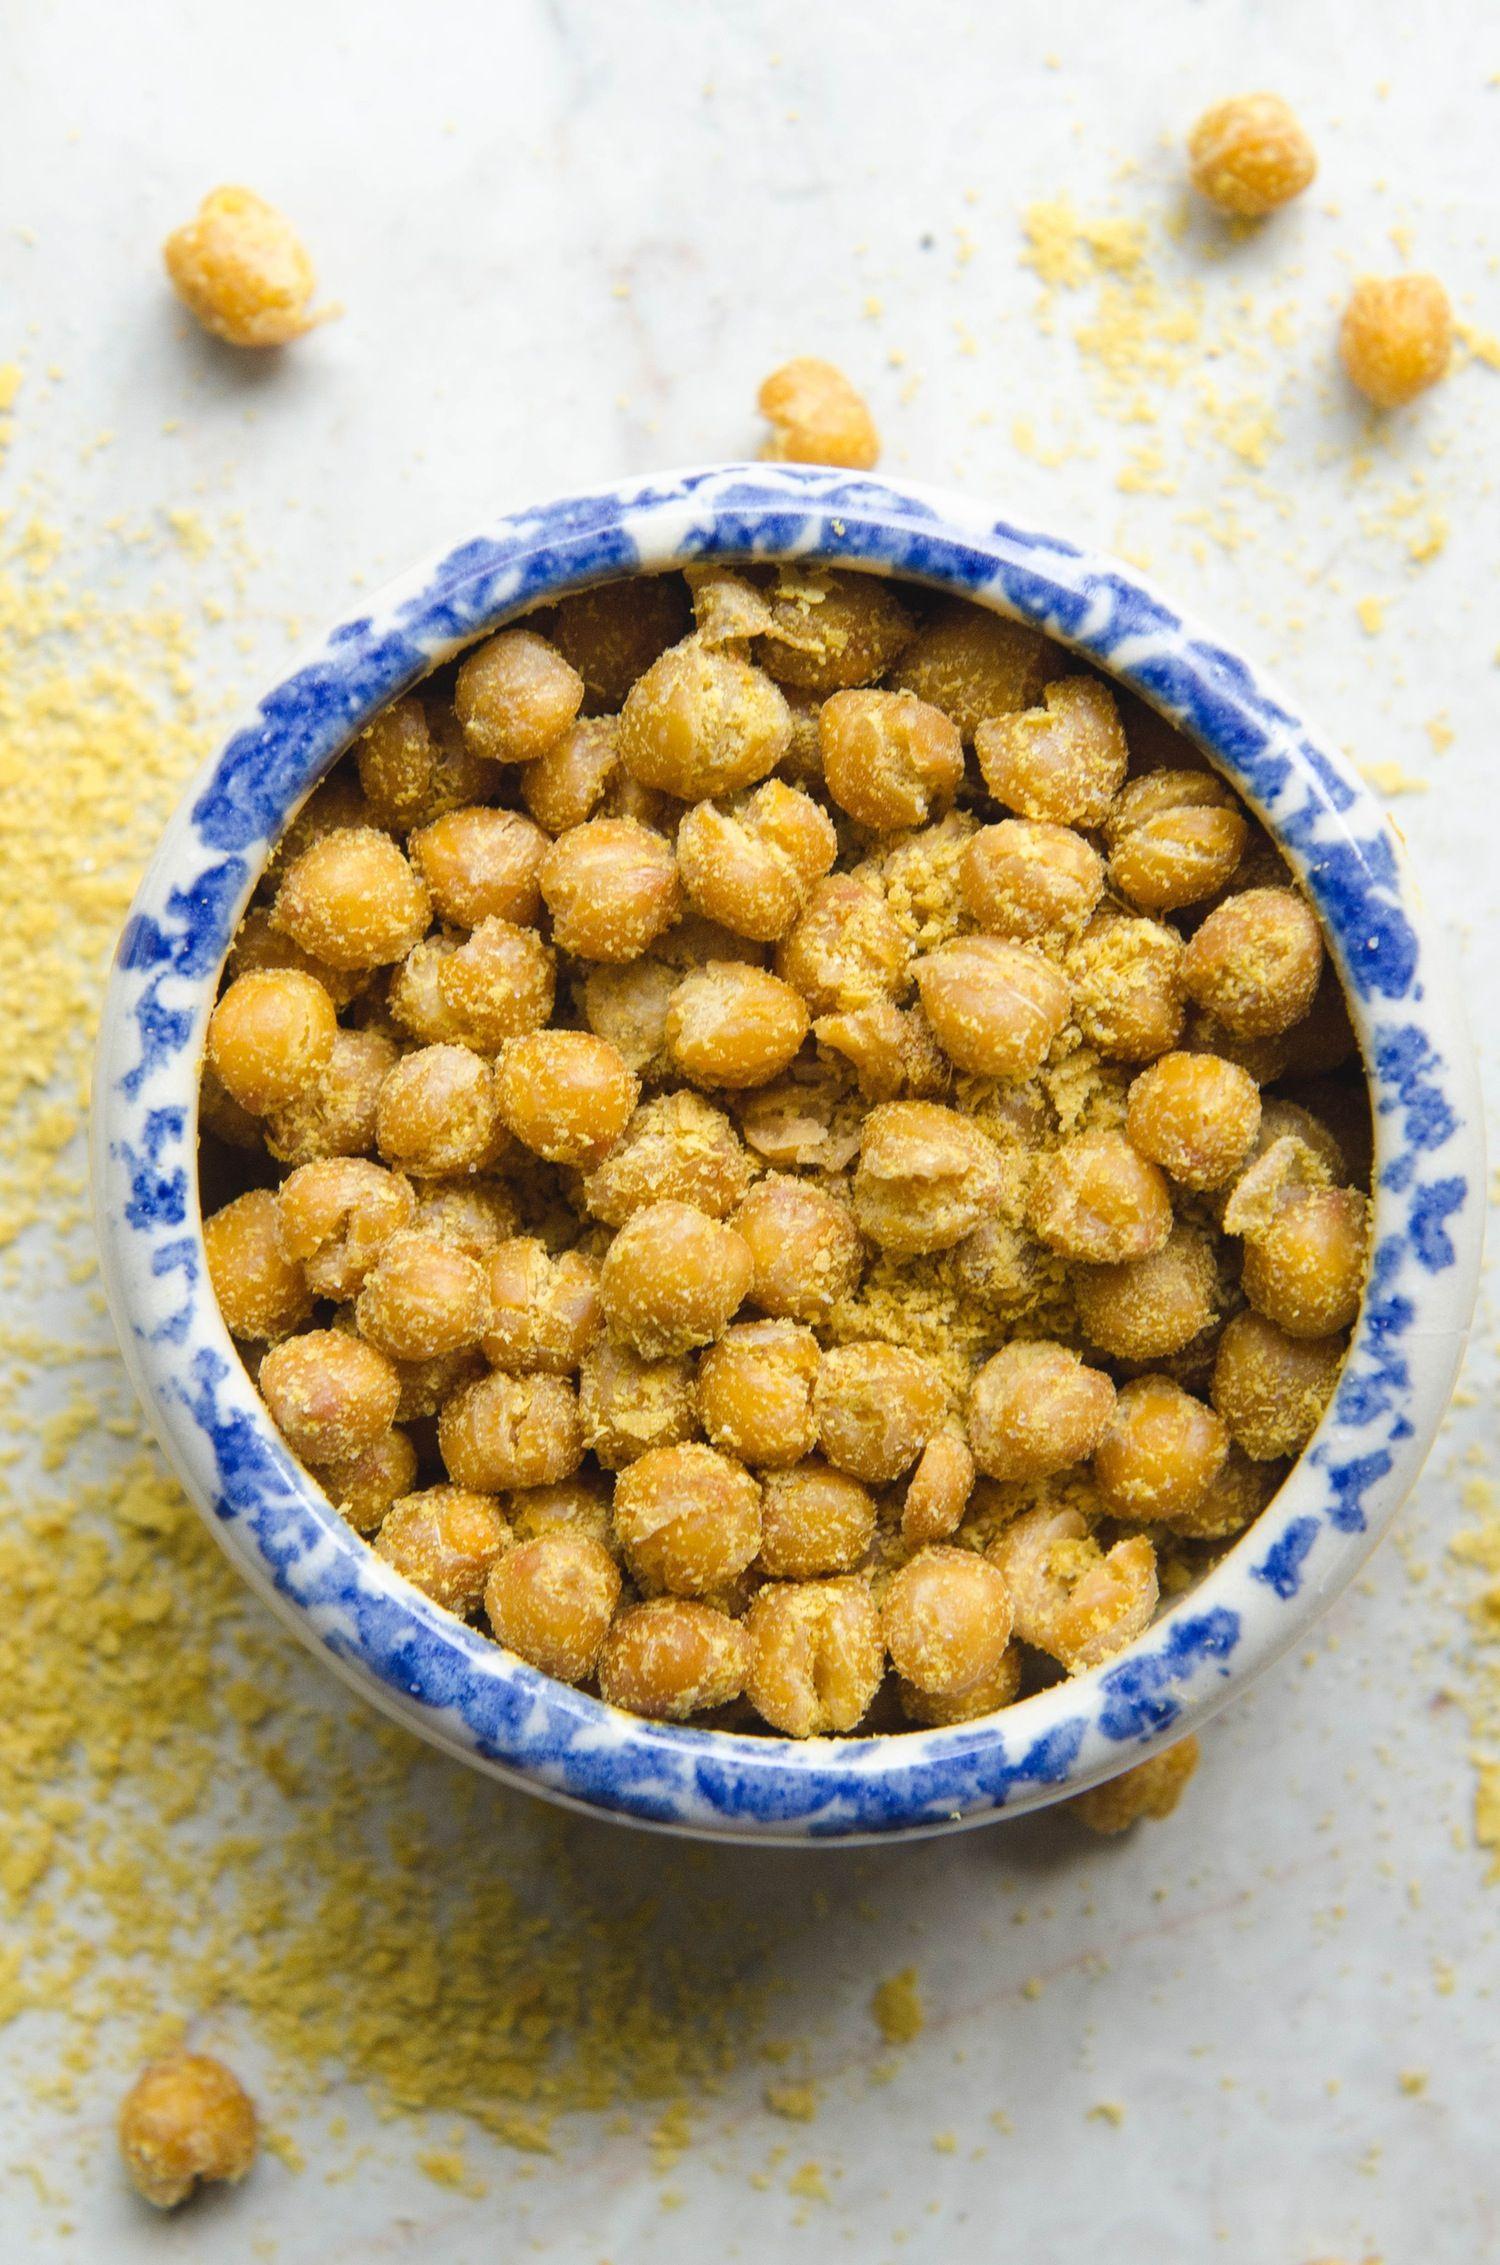 Recipe: Cheetos-Style Chickpeas — Vegan Munchies by Gina Eykemans